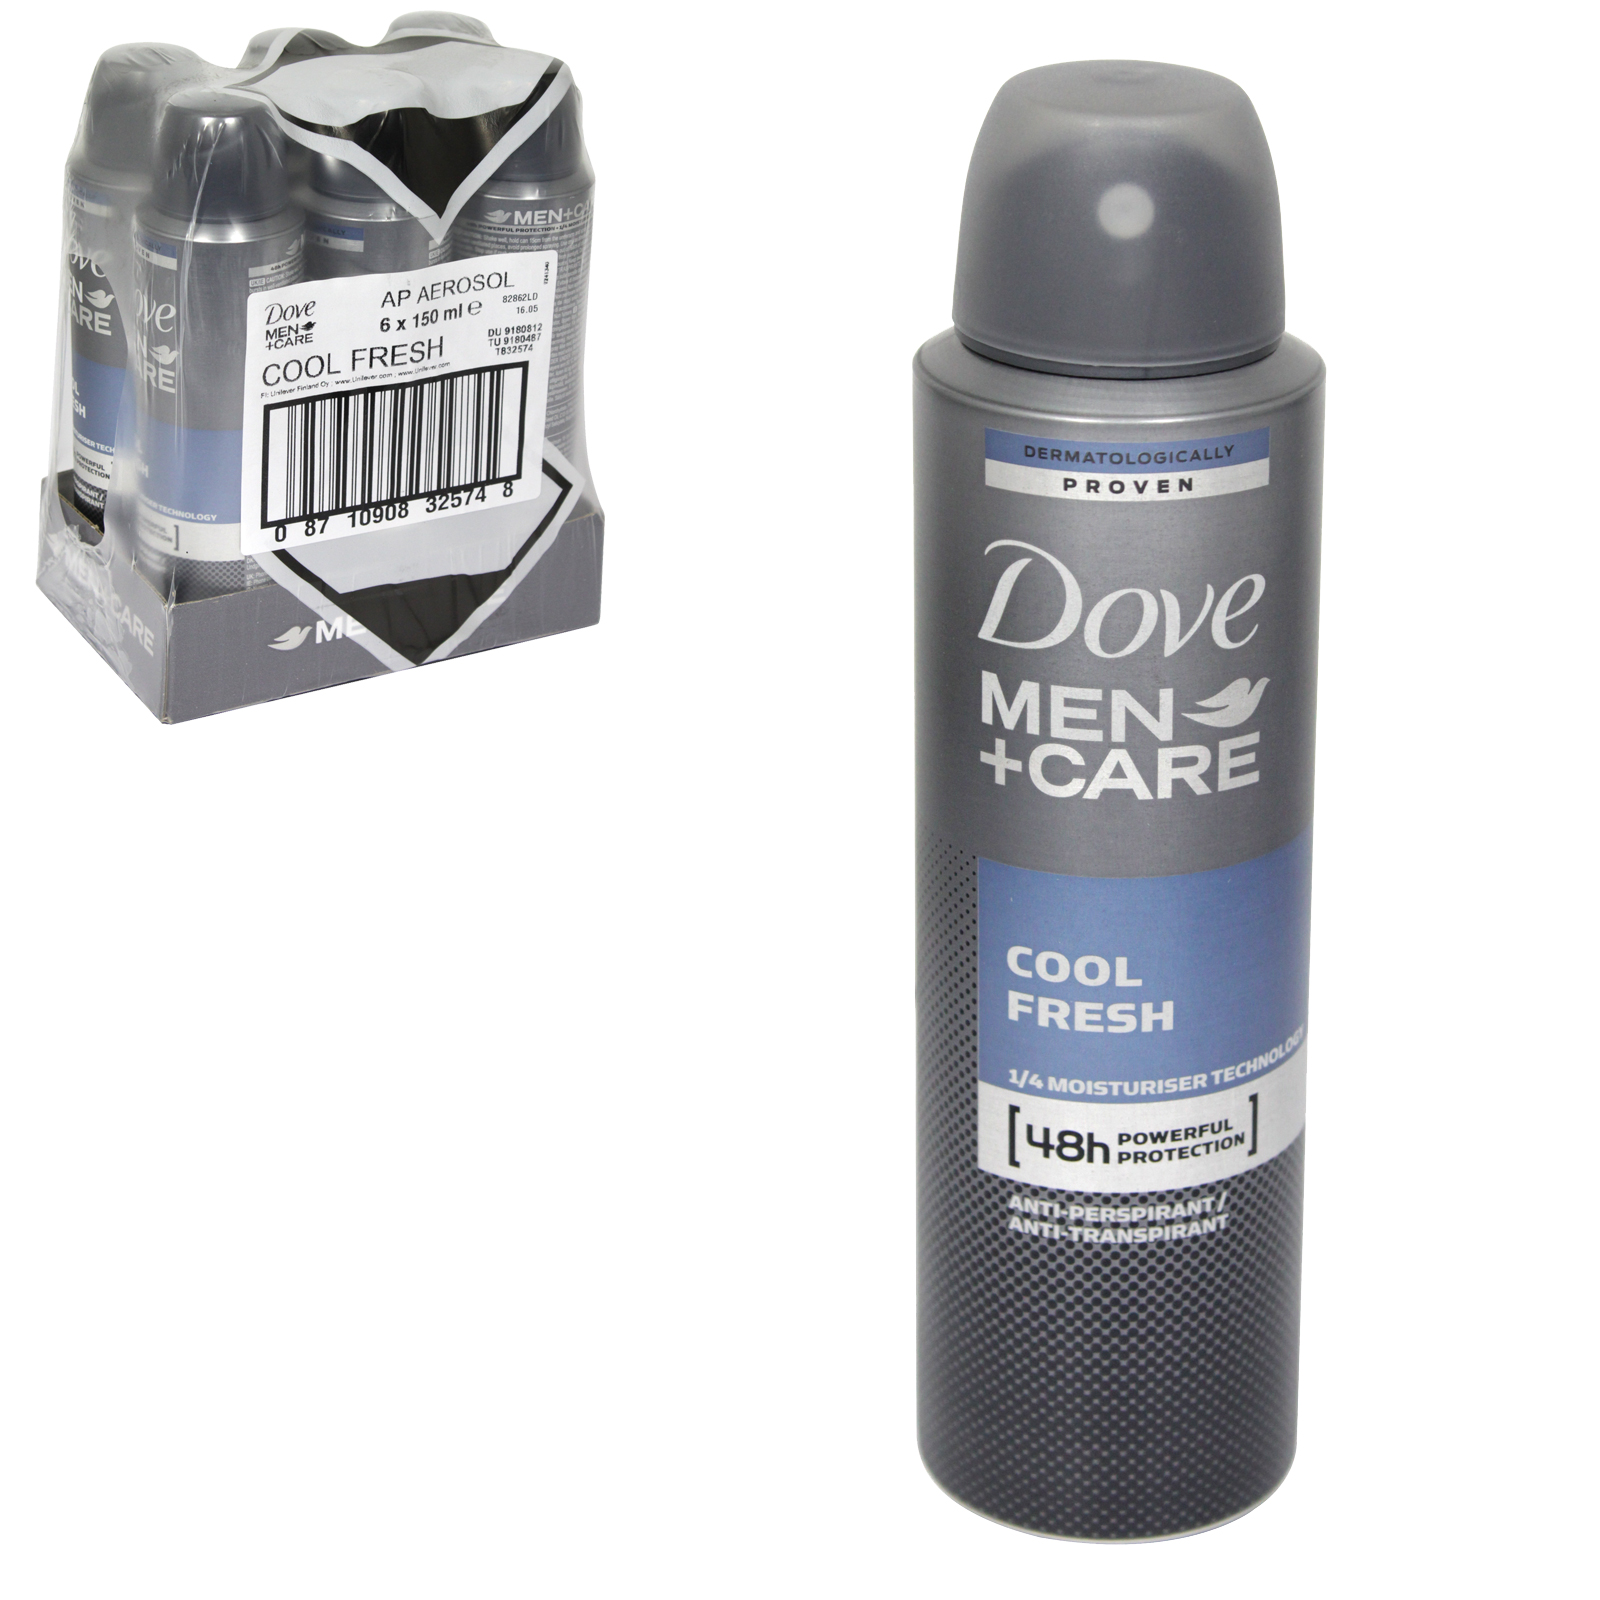 DOVE MEN+CARE APA 150ML COOL FRESH X 6